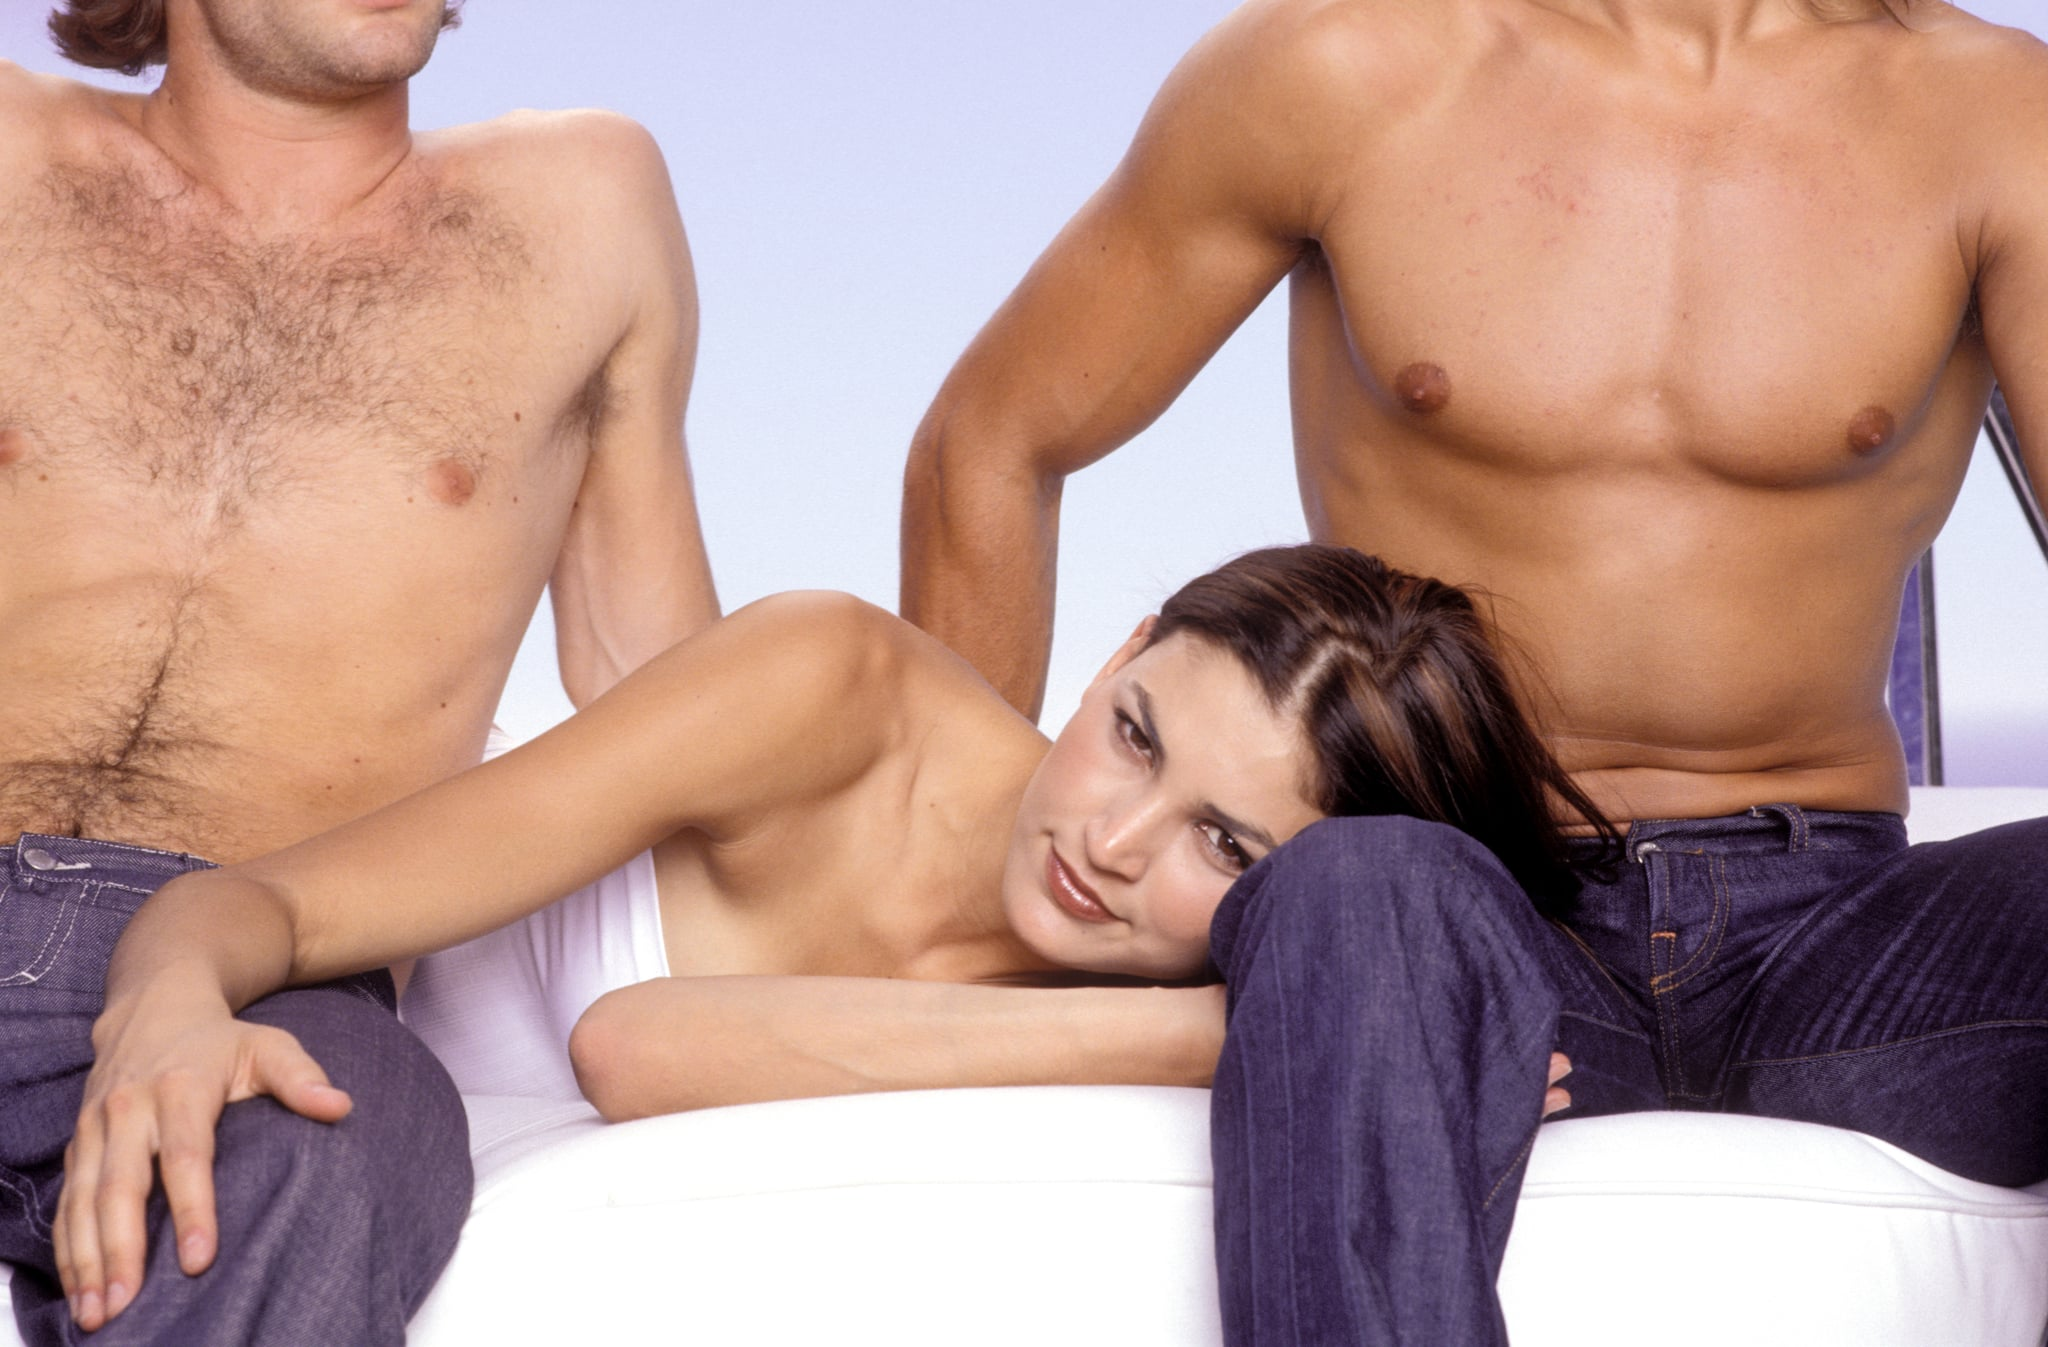 Sling gay sex dating img